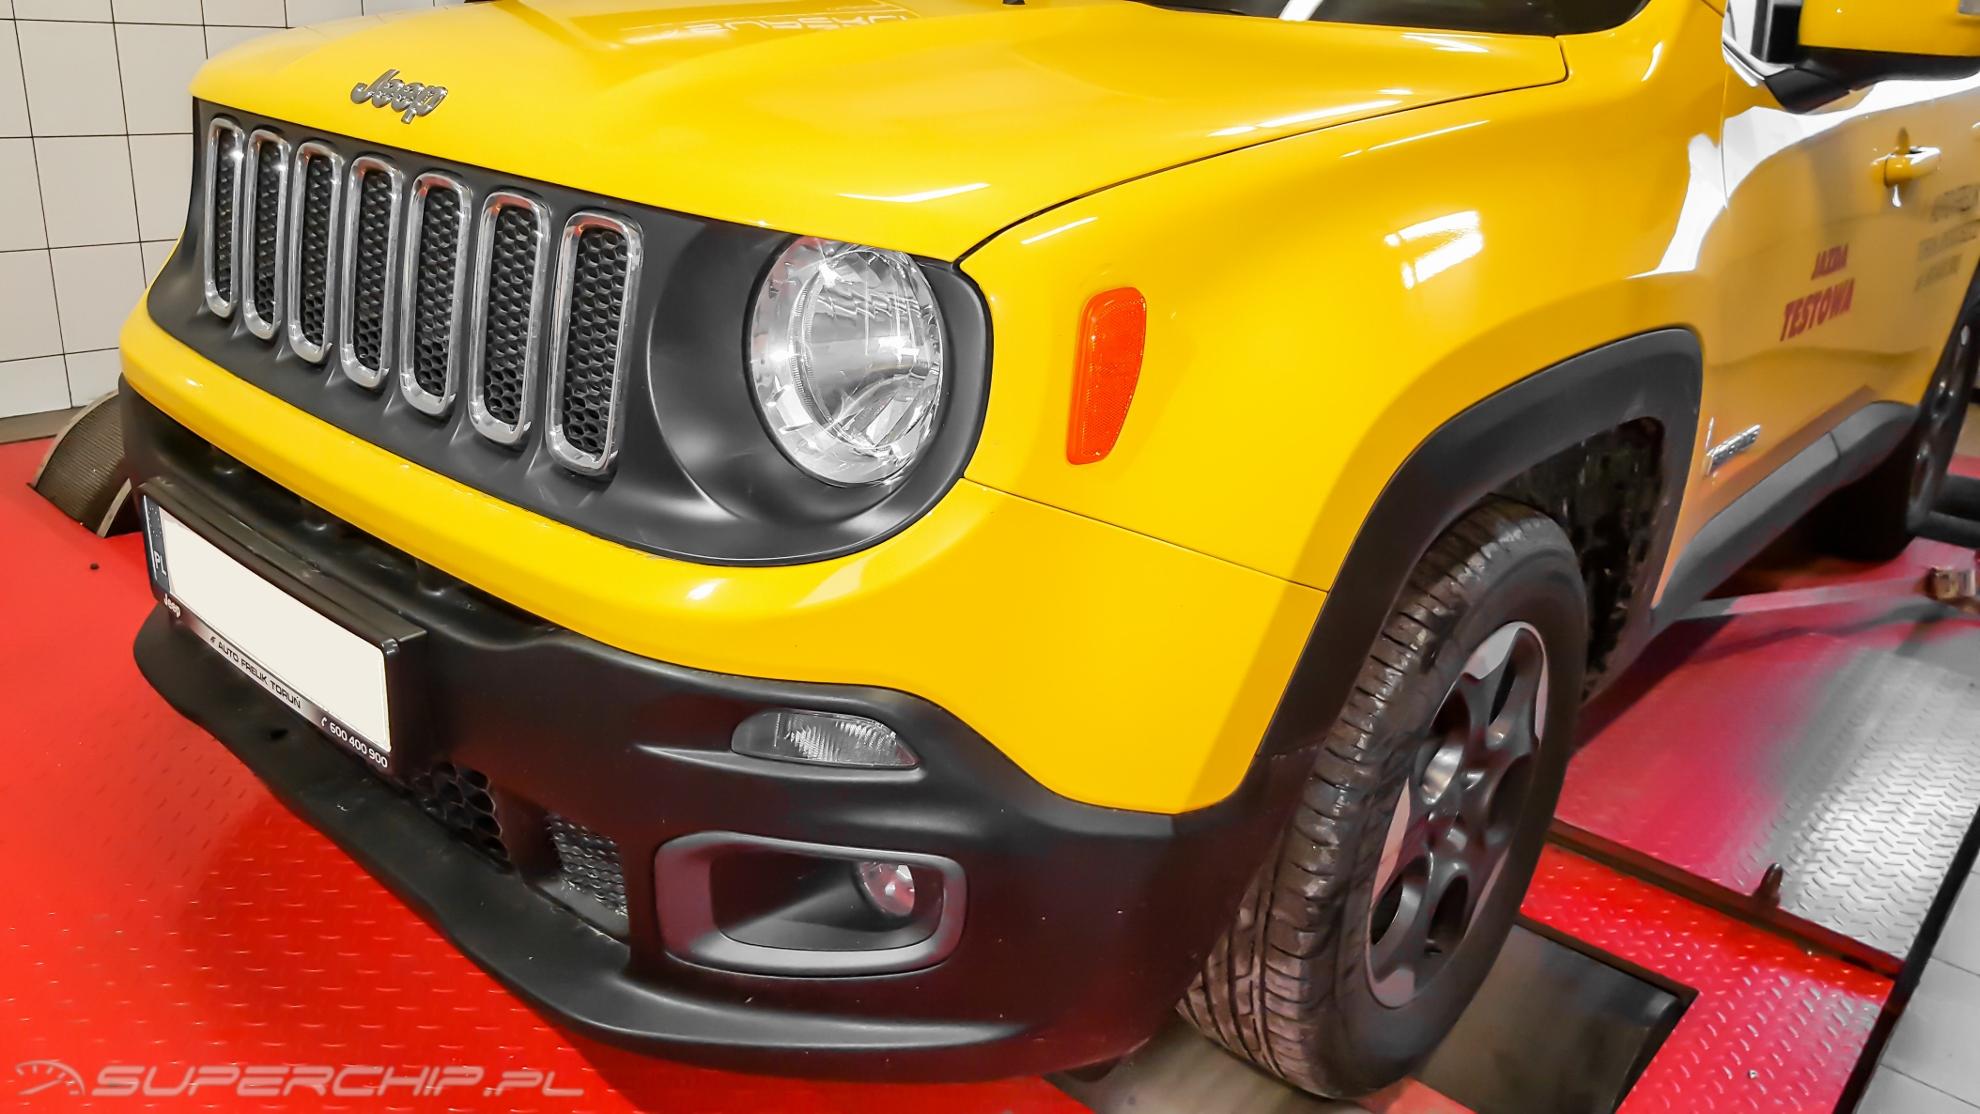 Jeep Renegade 1.4 Multiair 140 KM 103 kW( +21)